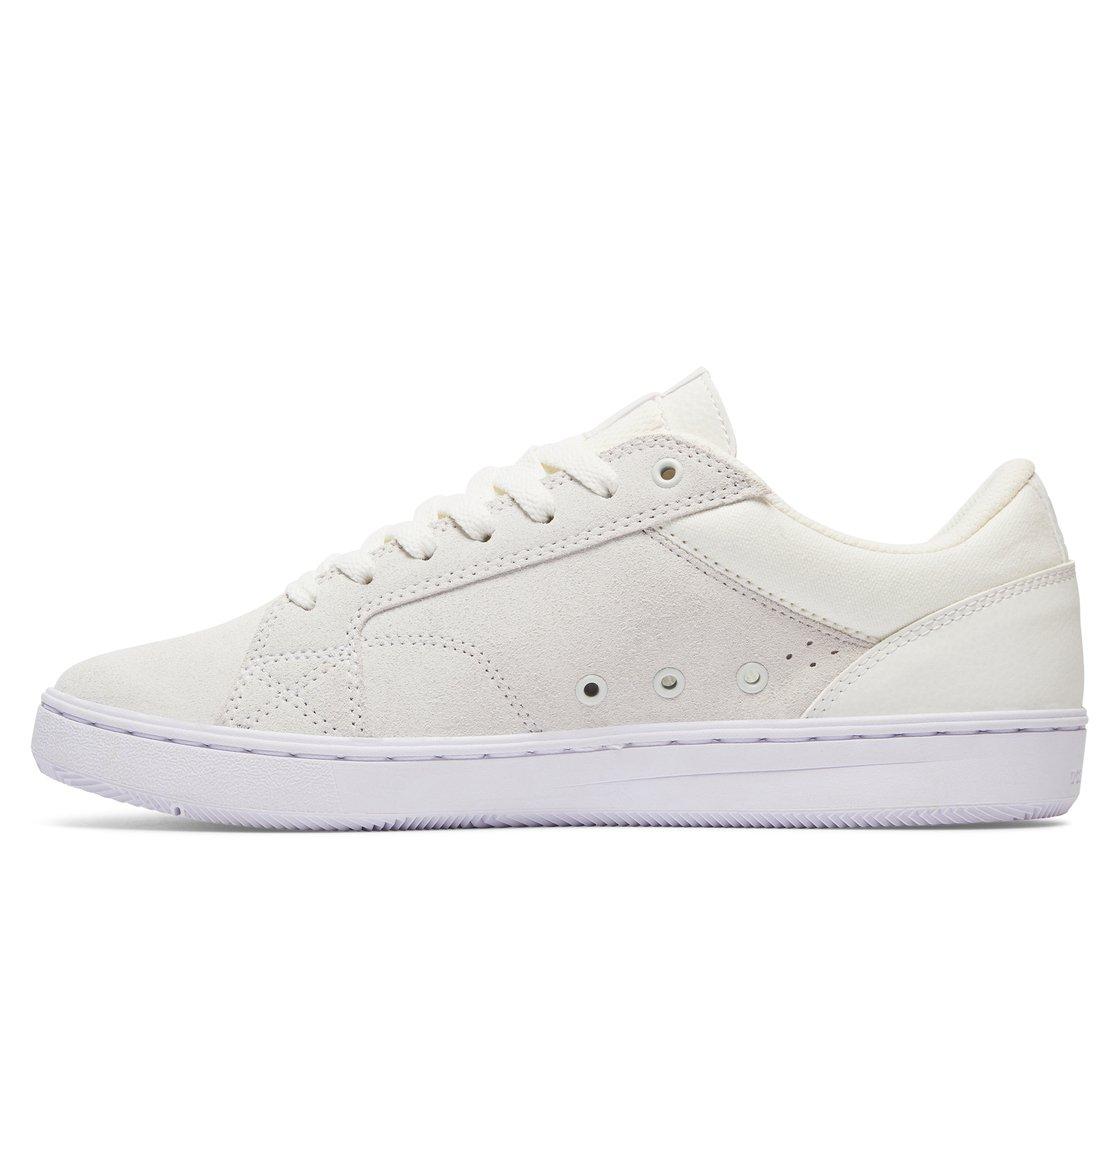 DC Shoes ASTOR - Skate shoes - white / black